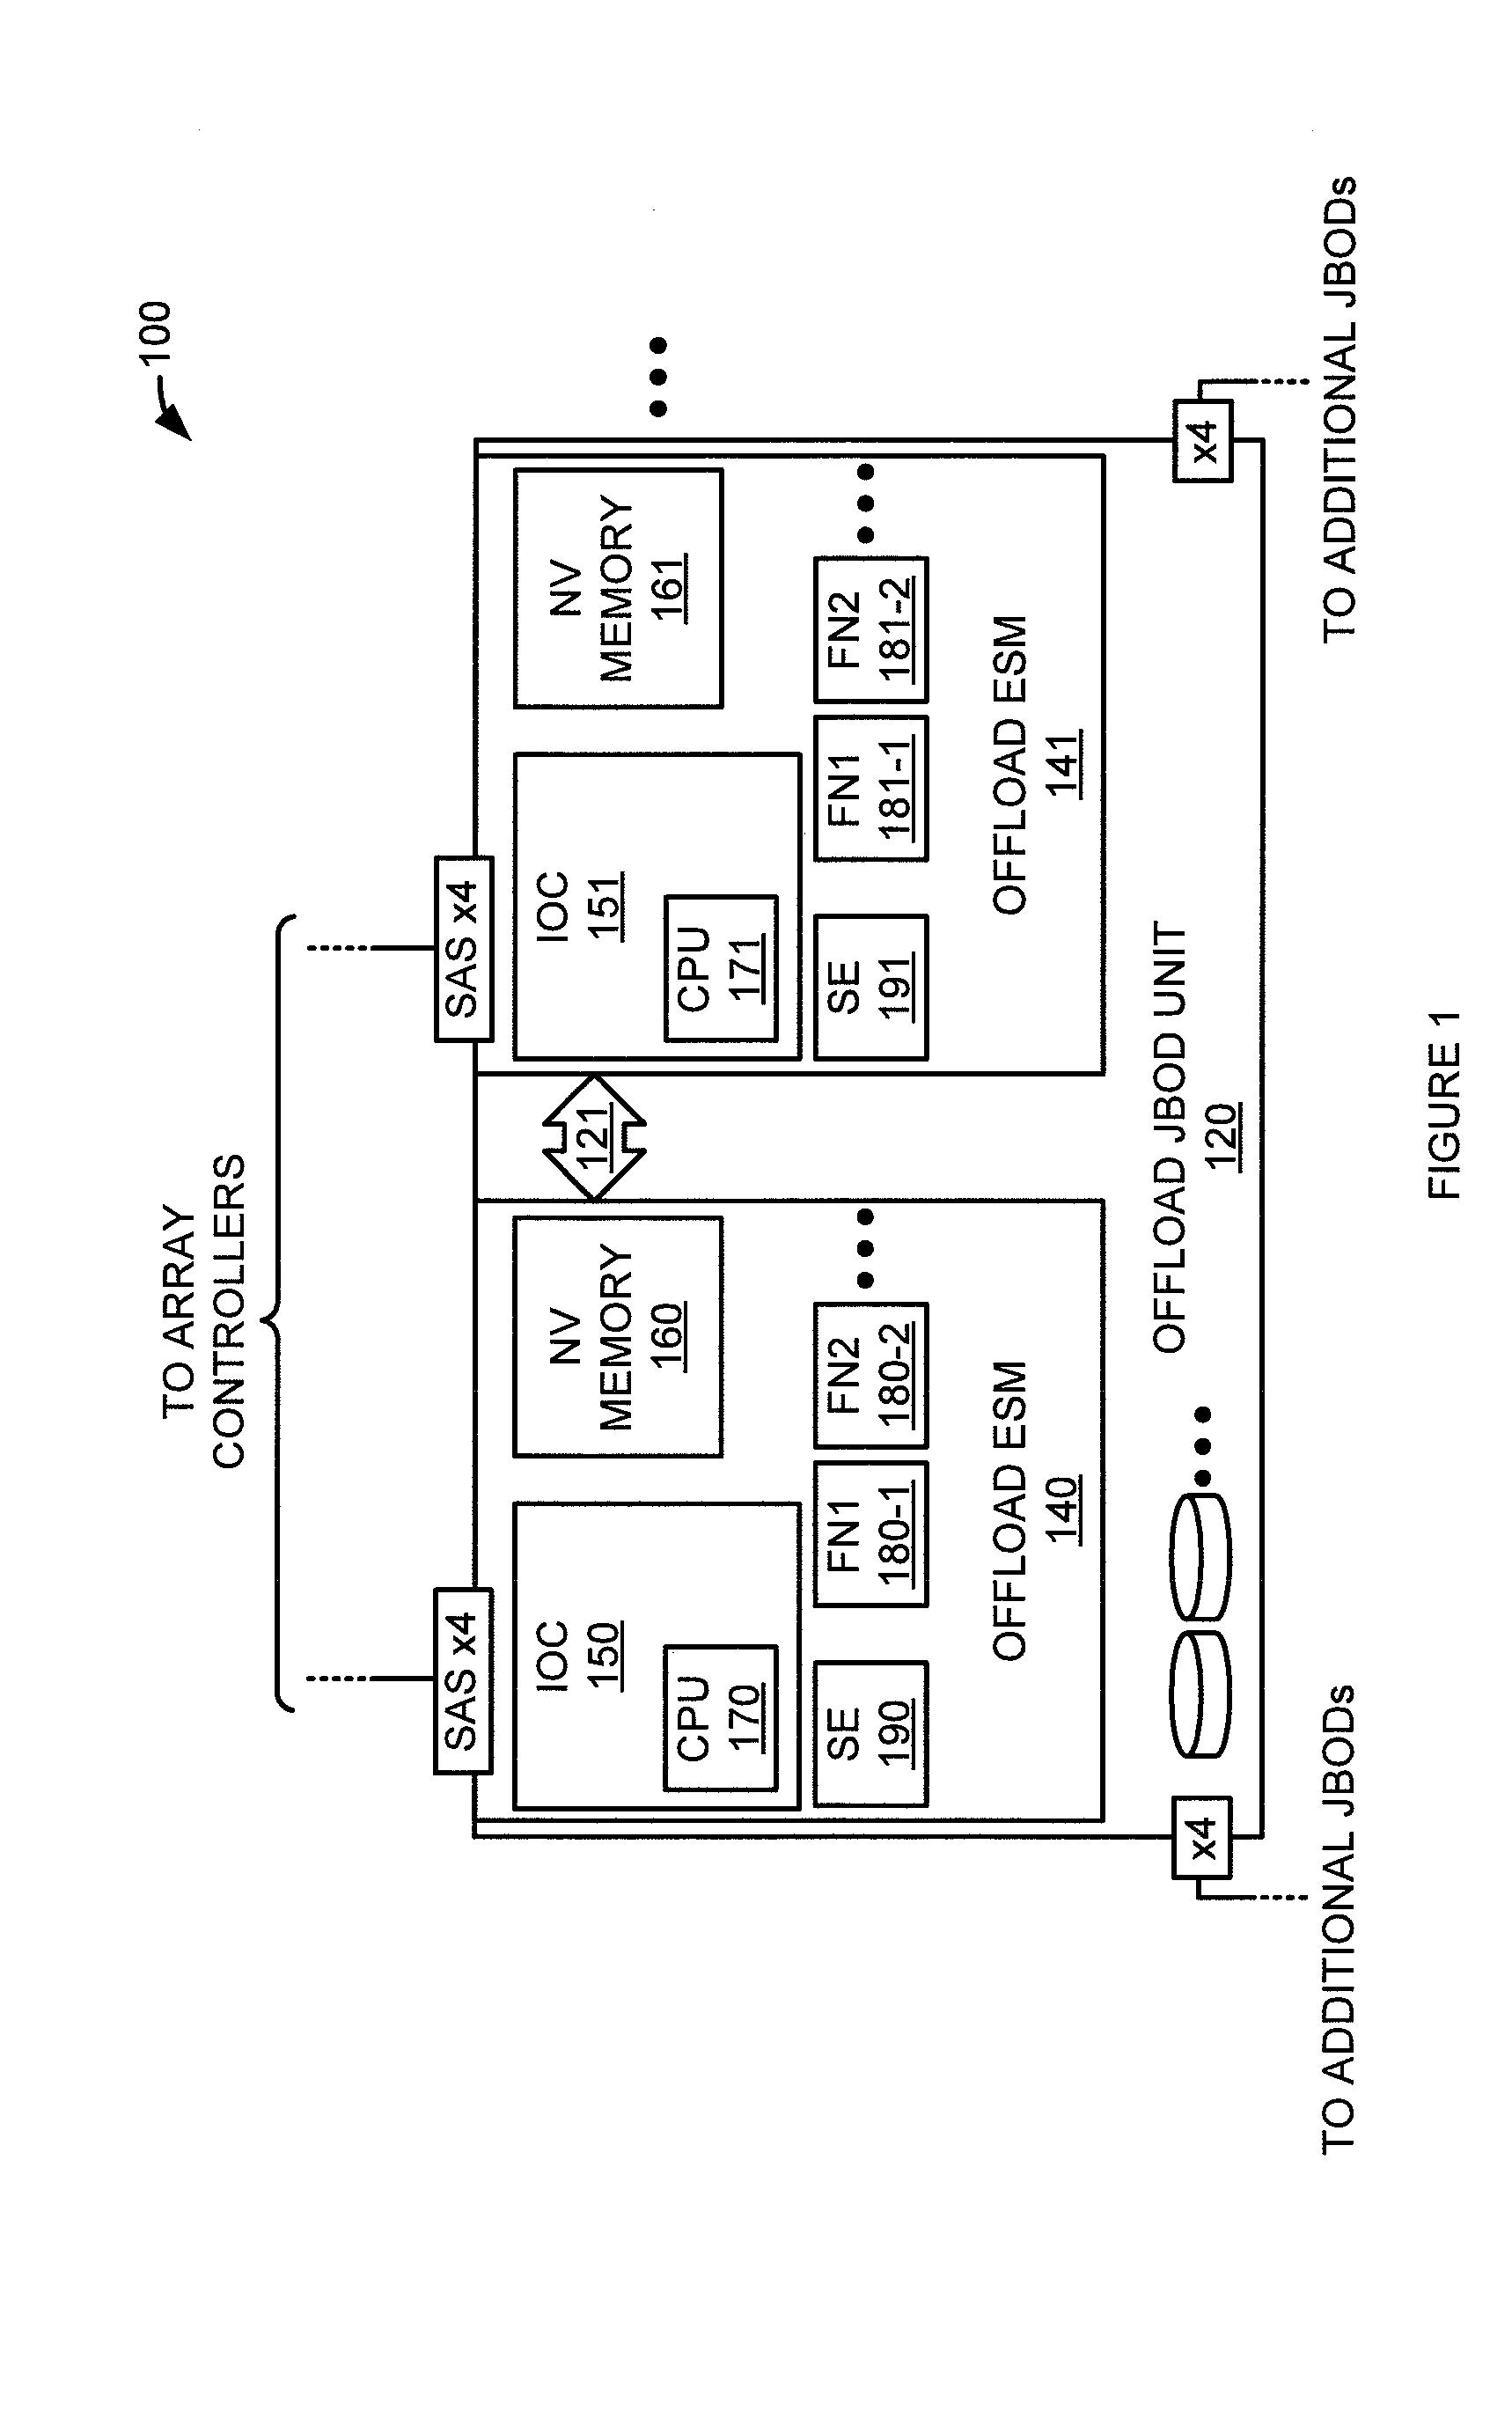 Arduino - Arrays